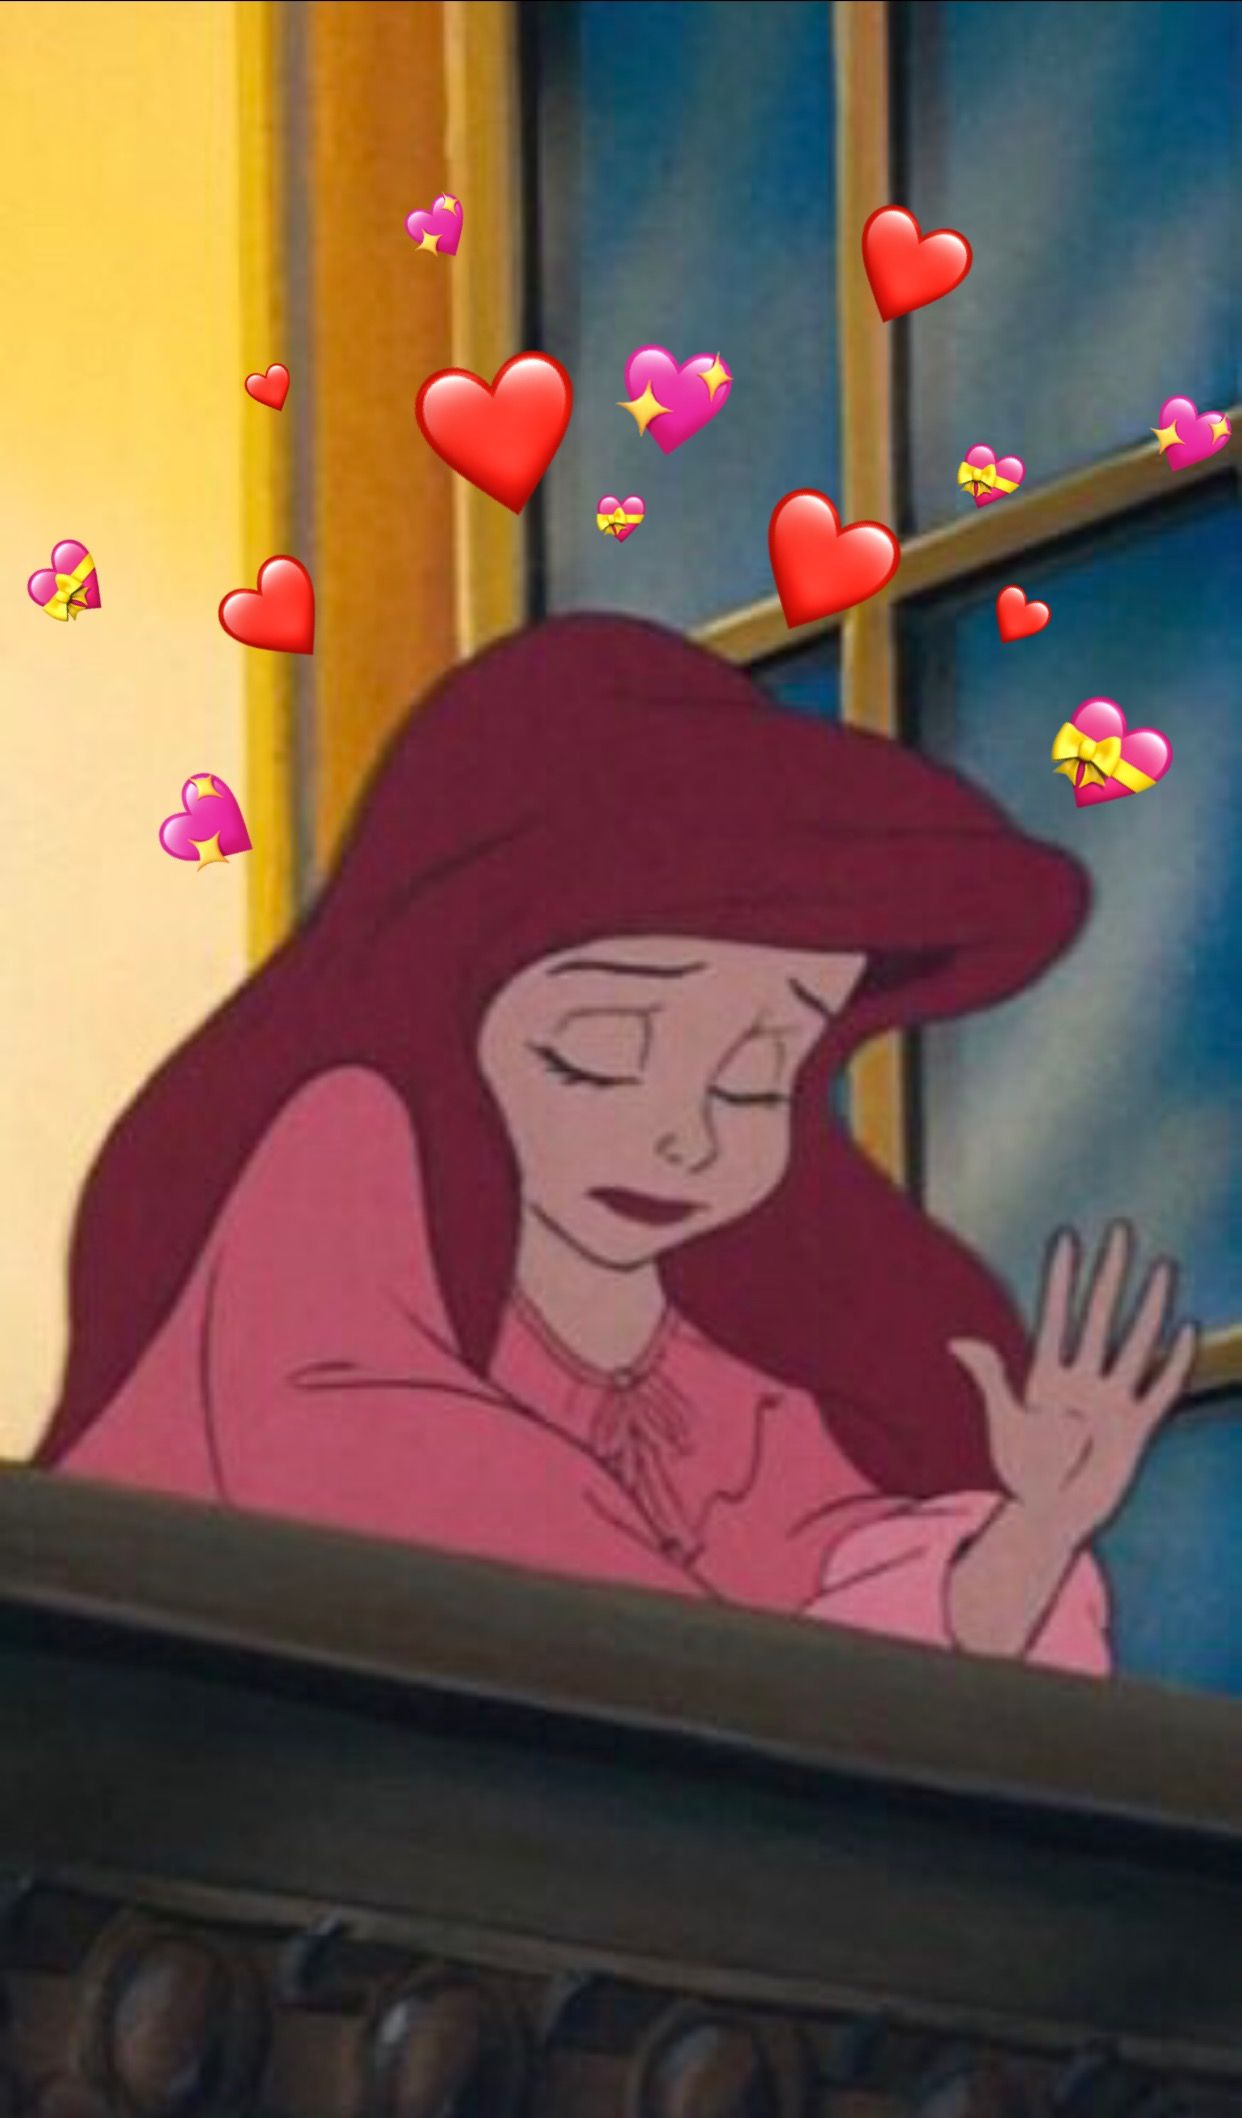 Ariel Heart Meme Cartoon Wallpaper Disney Wallpaper Cartoon Profile Pictures